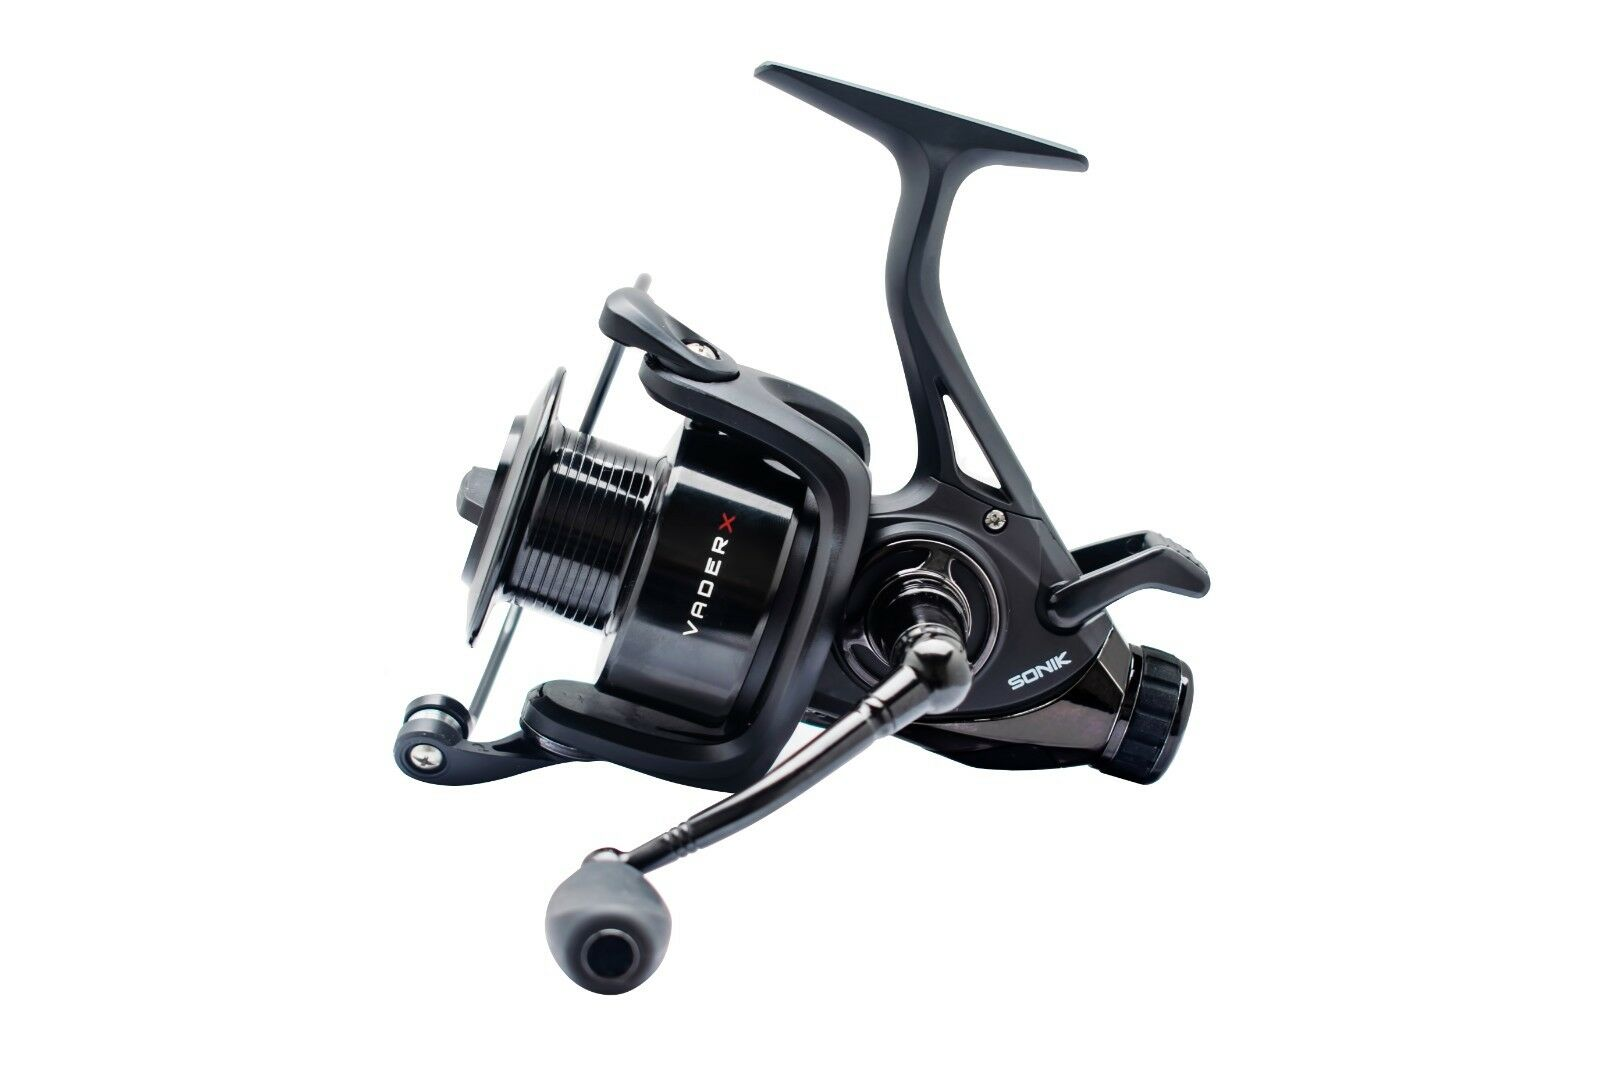 SONIK VADER X 5000 or 6000 FS FISHING REEL - Carp Pike Tench Bream Fishing